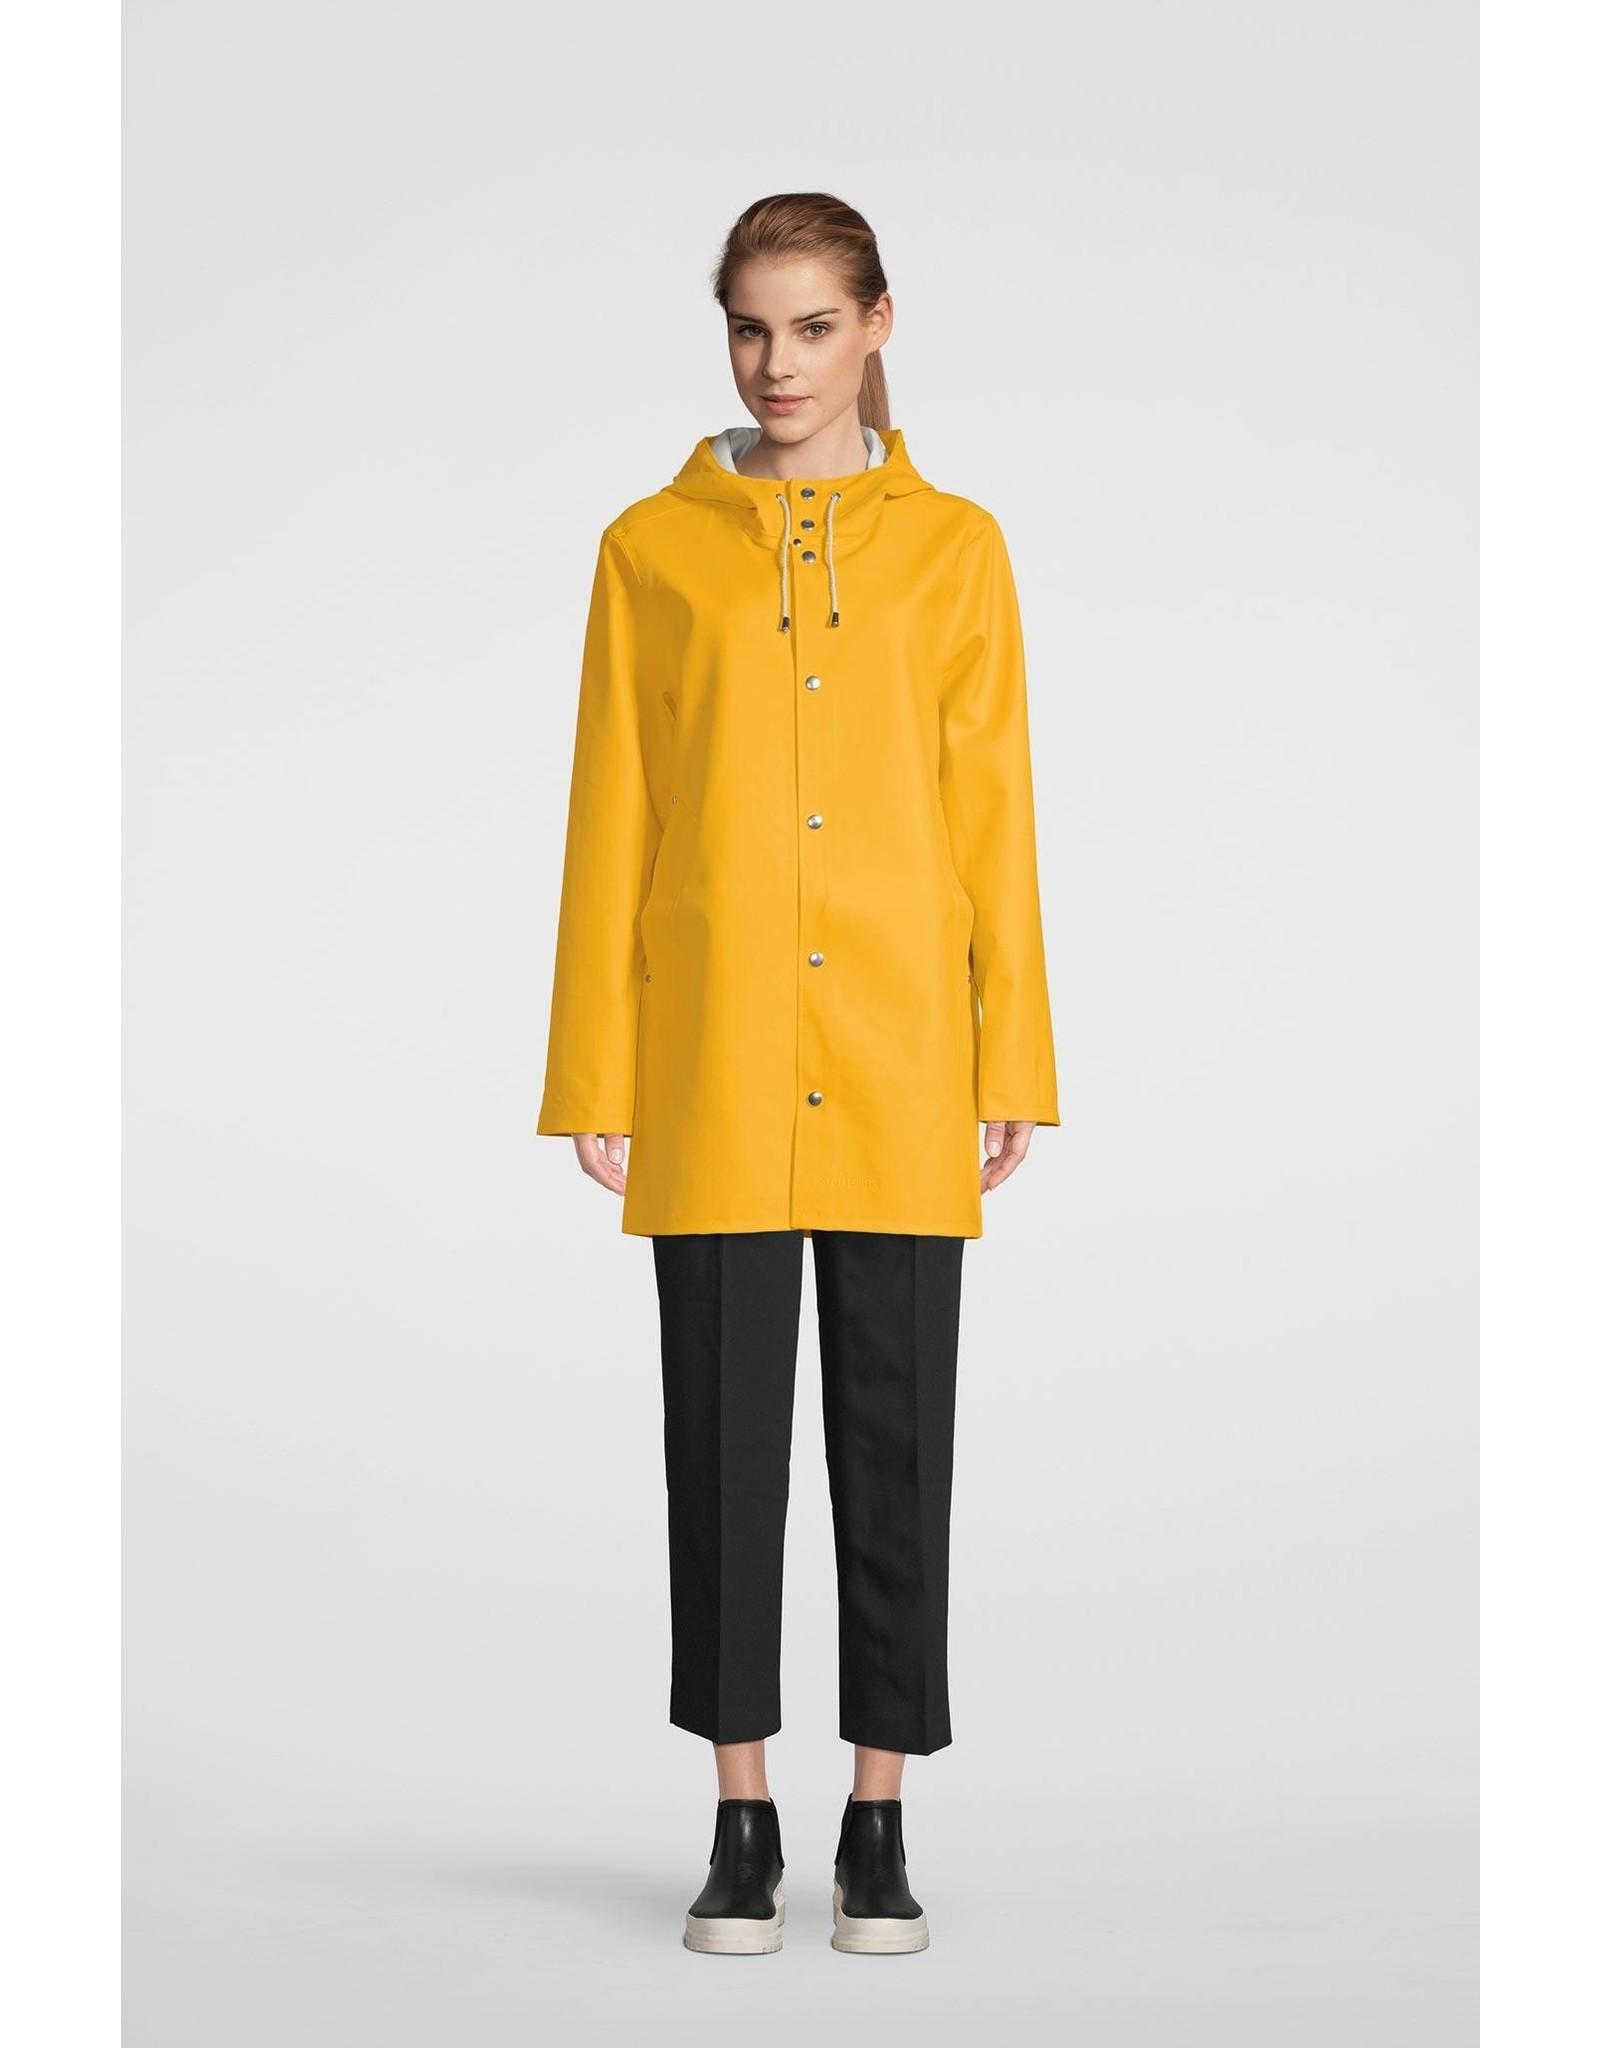 stutterheim mosebacke jacket